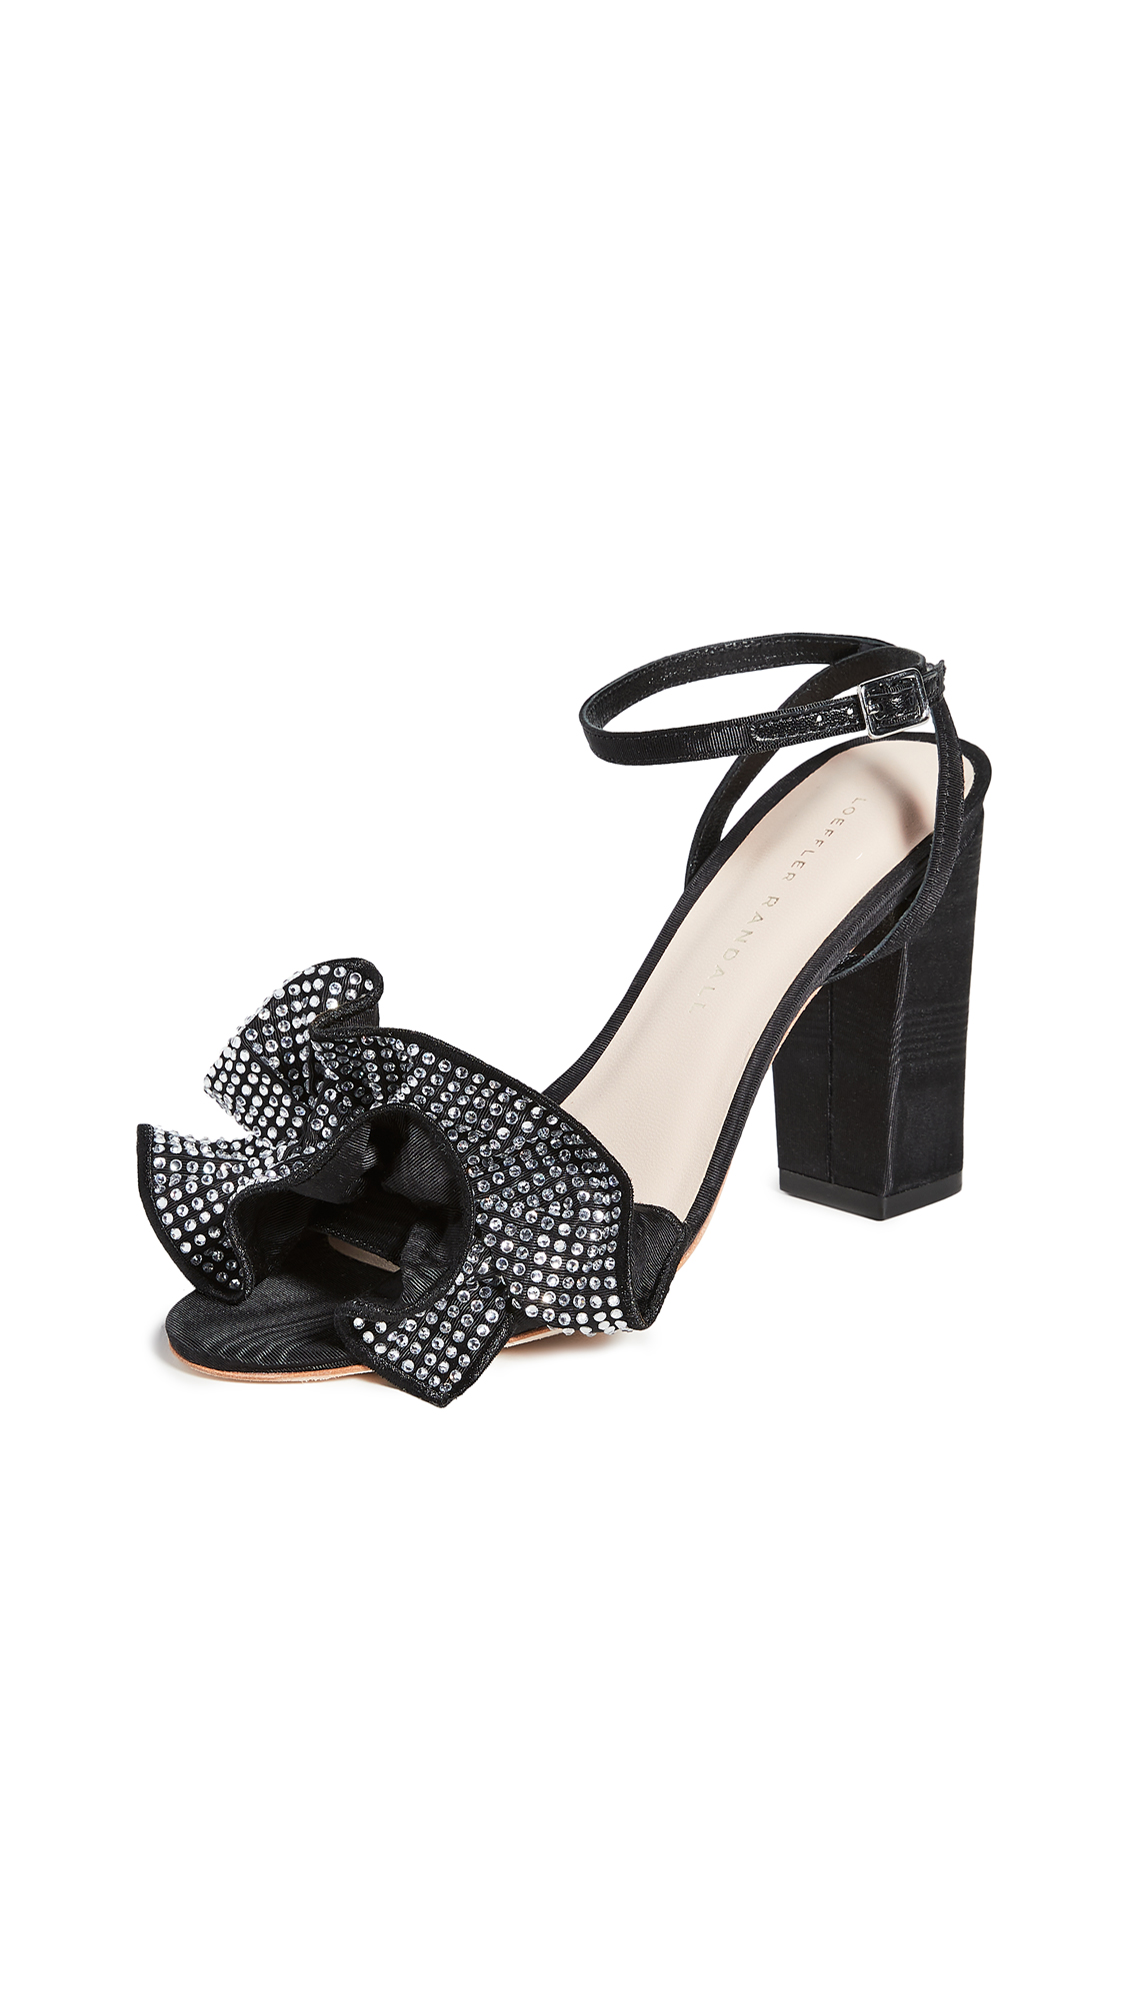 Buy Loeffler Randall online - photo of Loeffler Randall Savannah Ruffle Heel Sandals